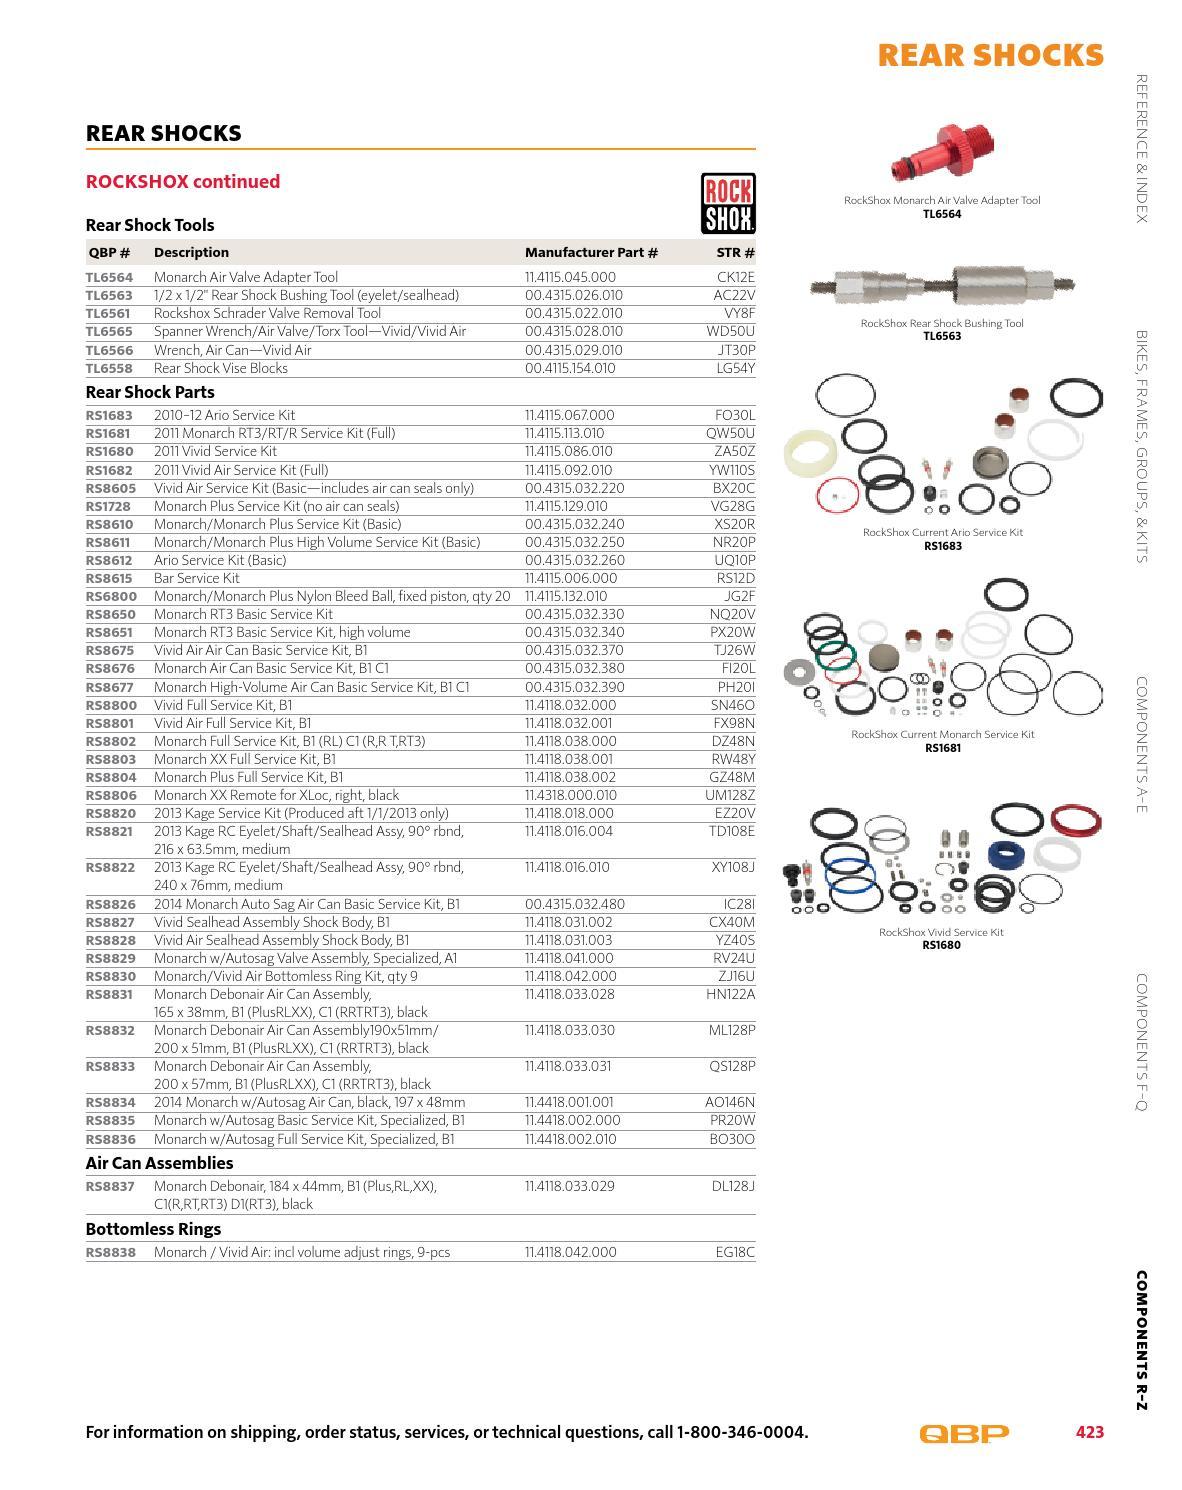 RT3 RRTRT3 D1 RockShox Rear Shock Service Kit Full: Monarch B1 C1 RL